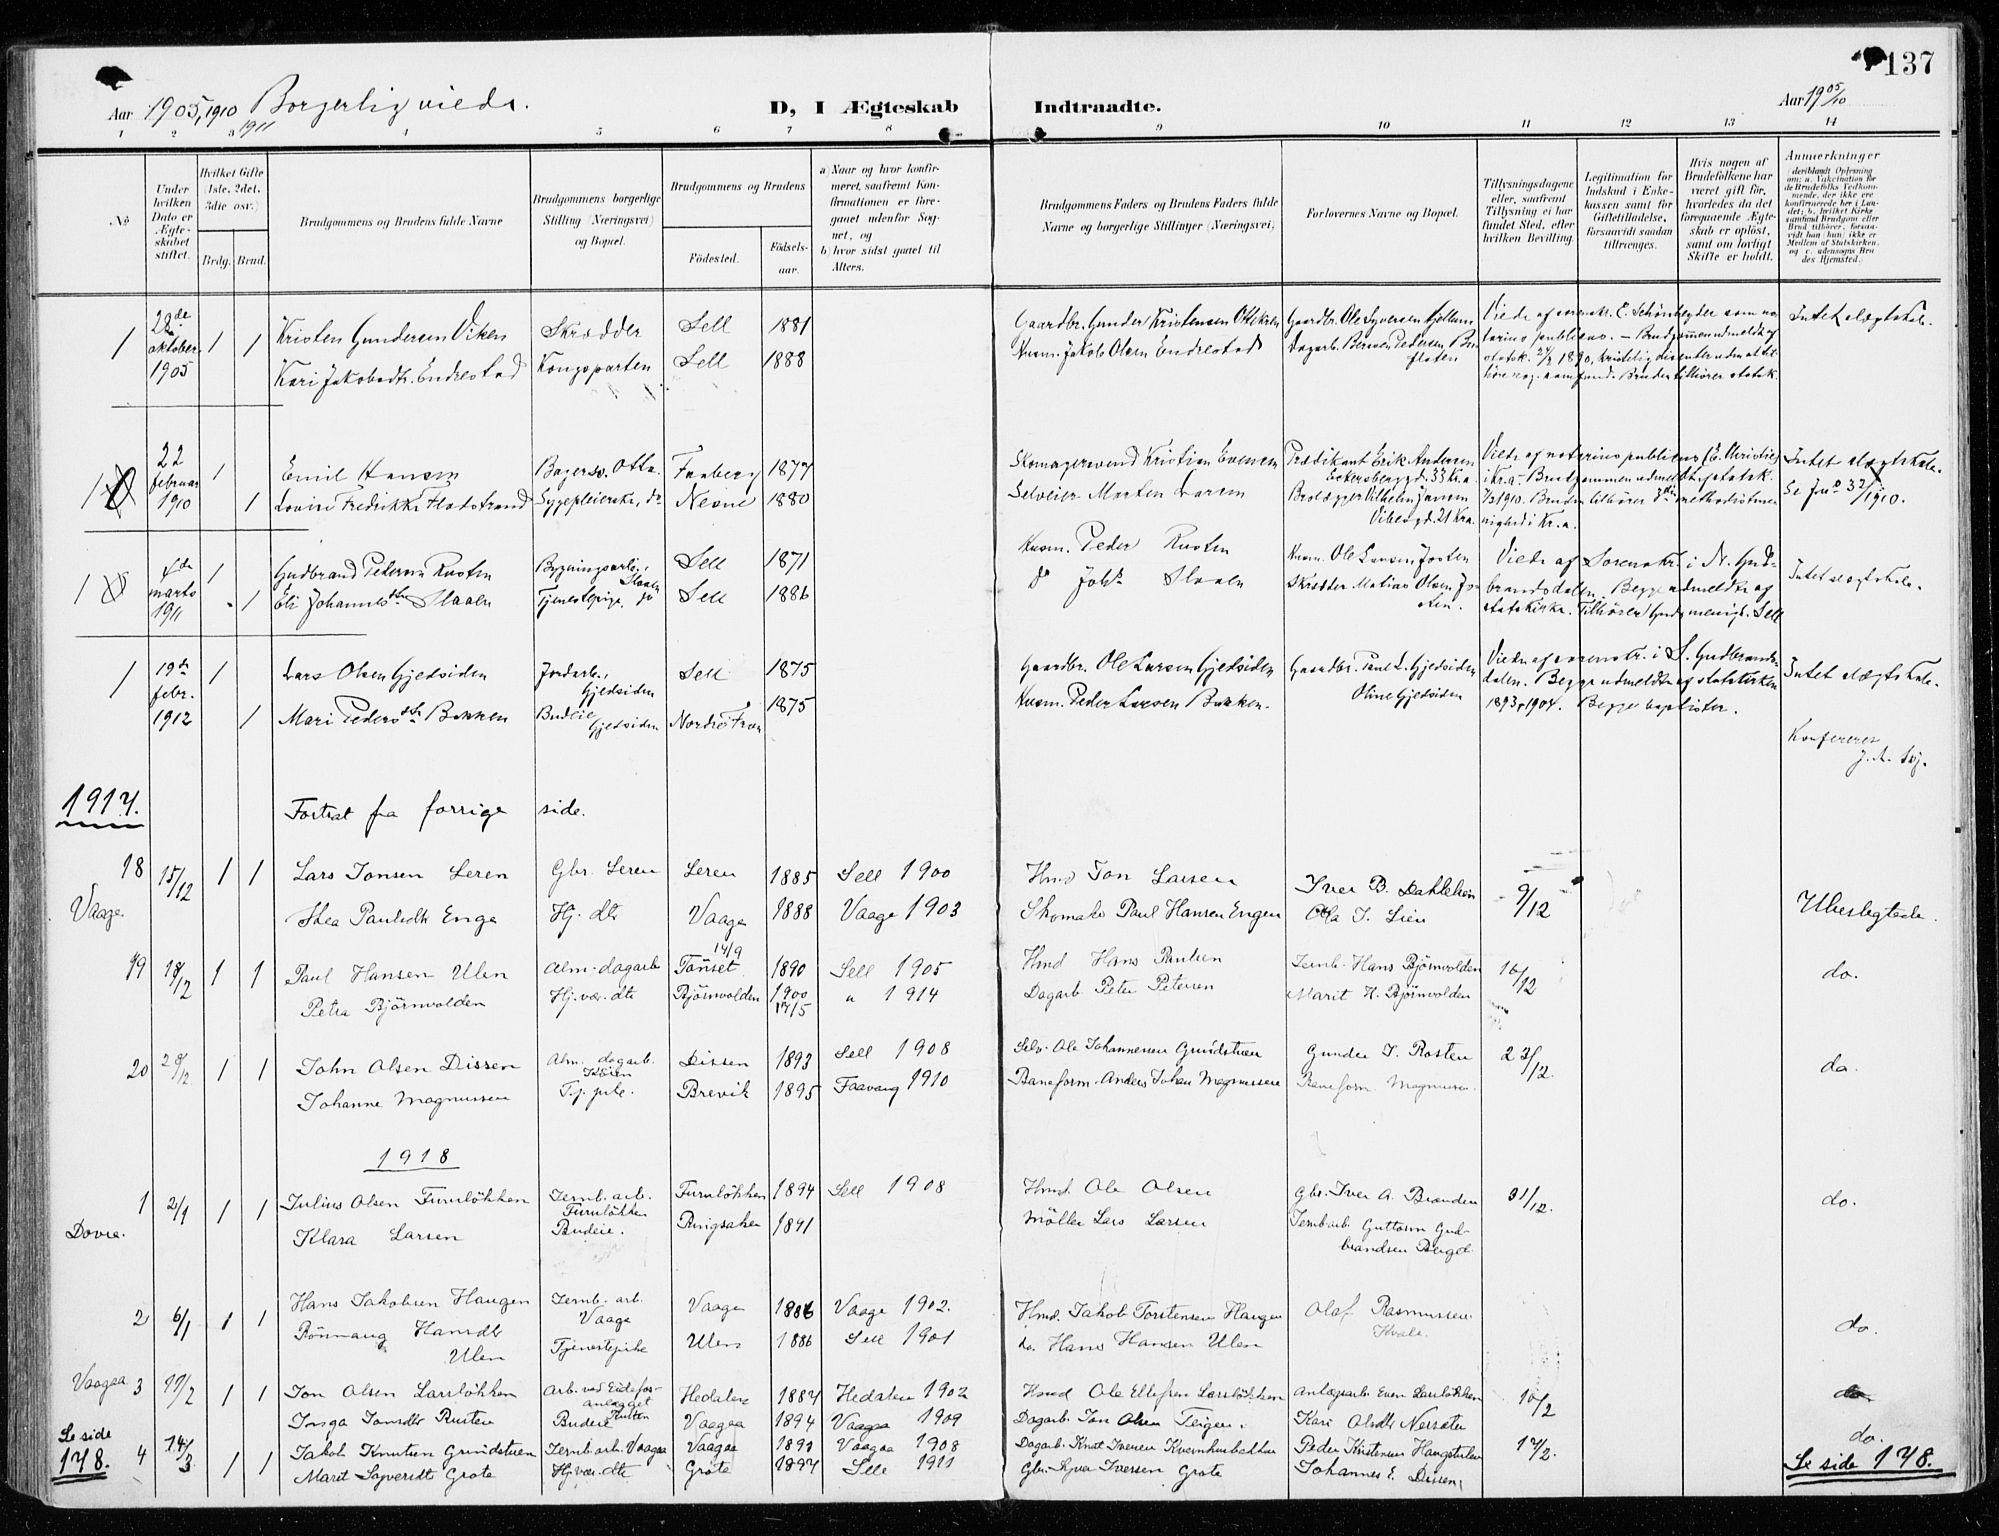 SAH, Sel prestekontor, Ministerialbok nr. 2, 1905-1919, s. 137